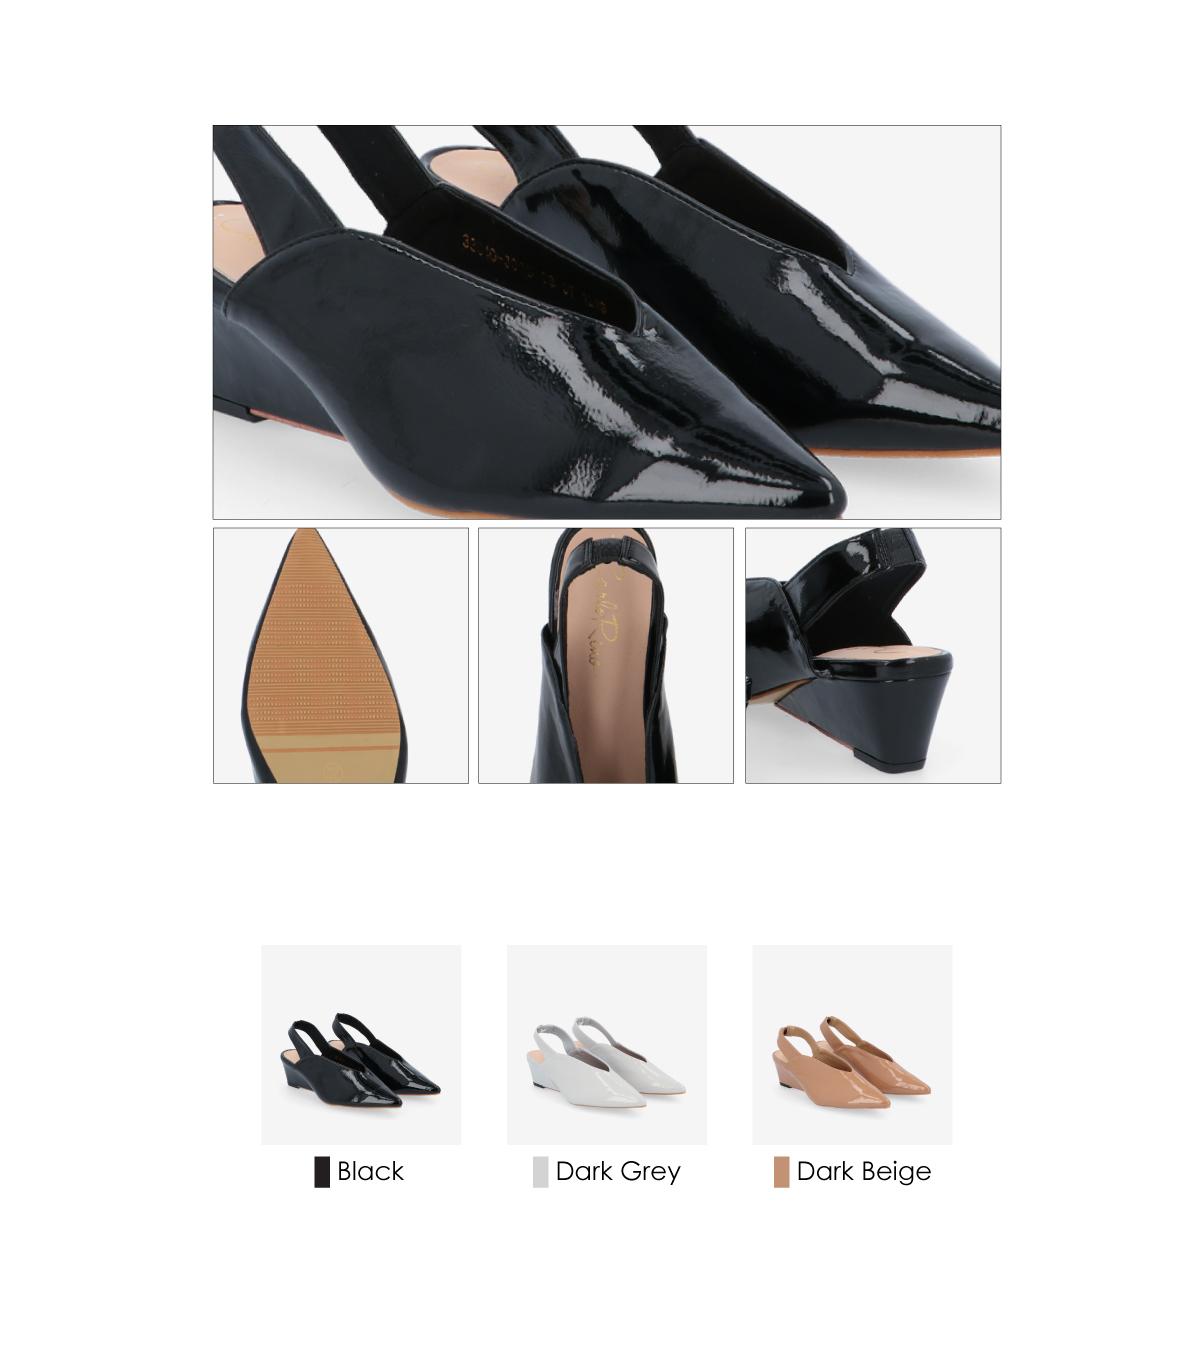 "33310 J005 3 - 2"" Glossy Sandy Slingback Heels"